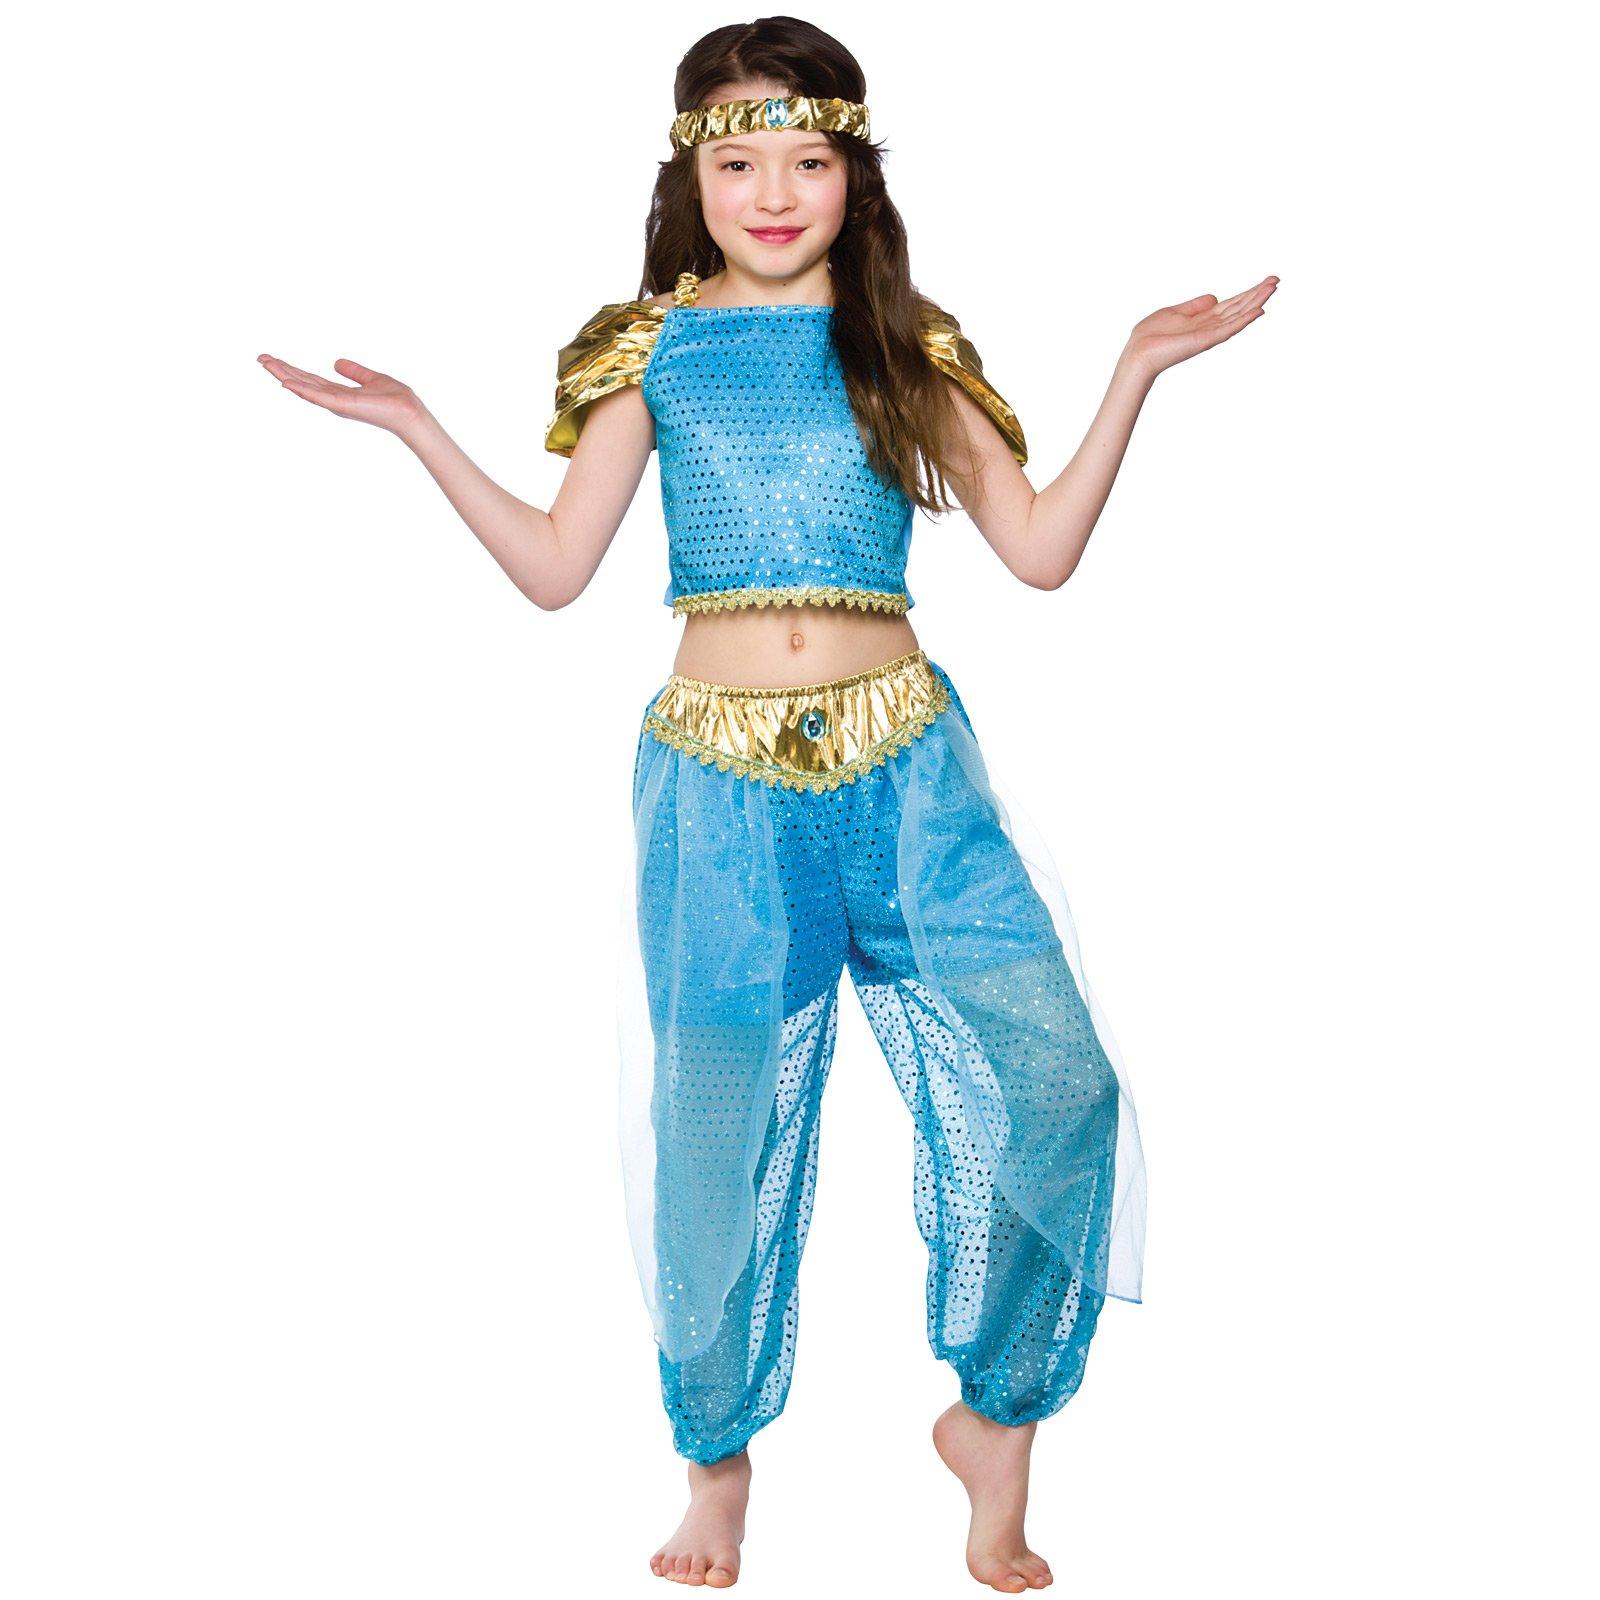 Jasmine Costume Kids: Amazon.co.uk